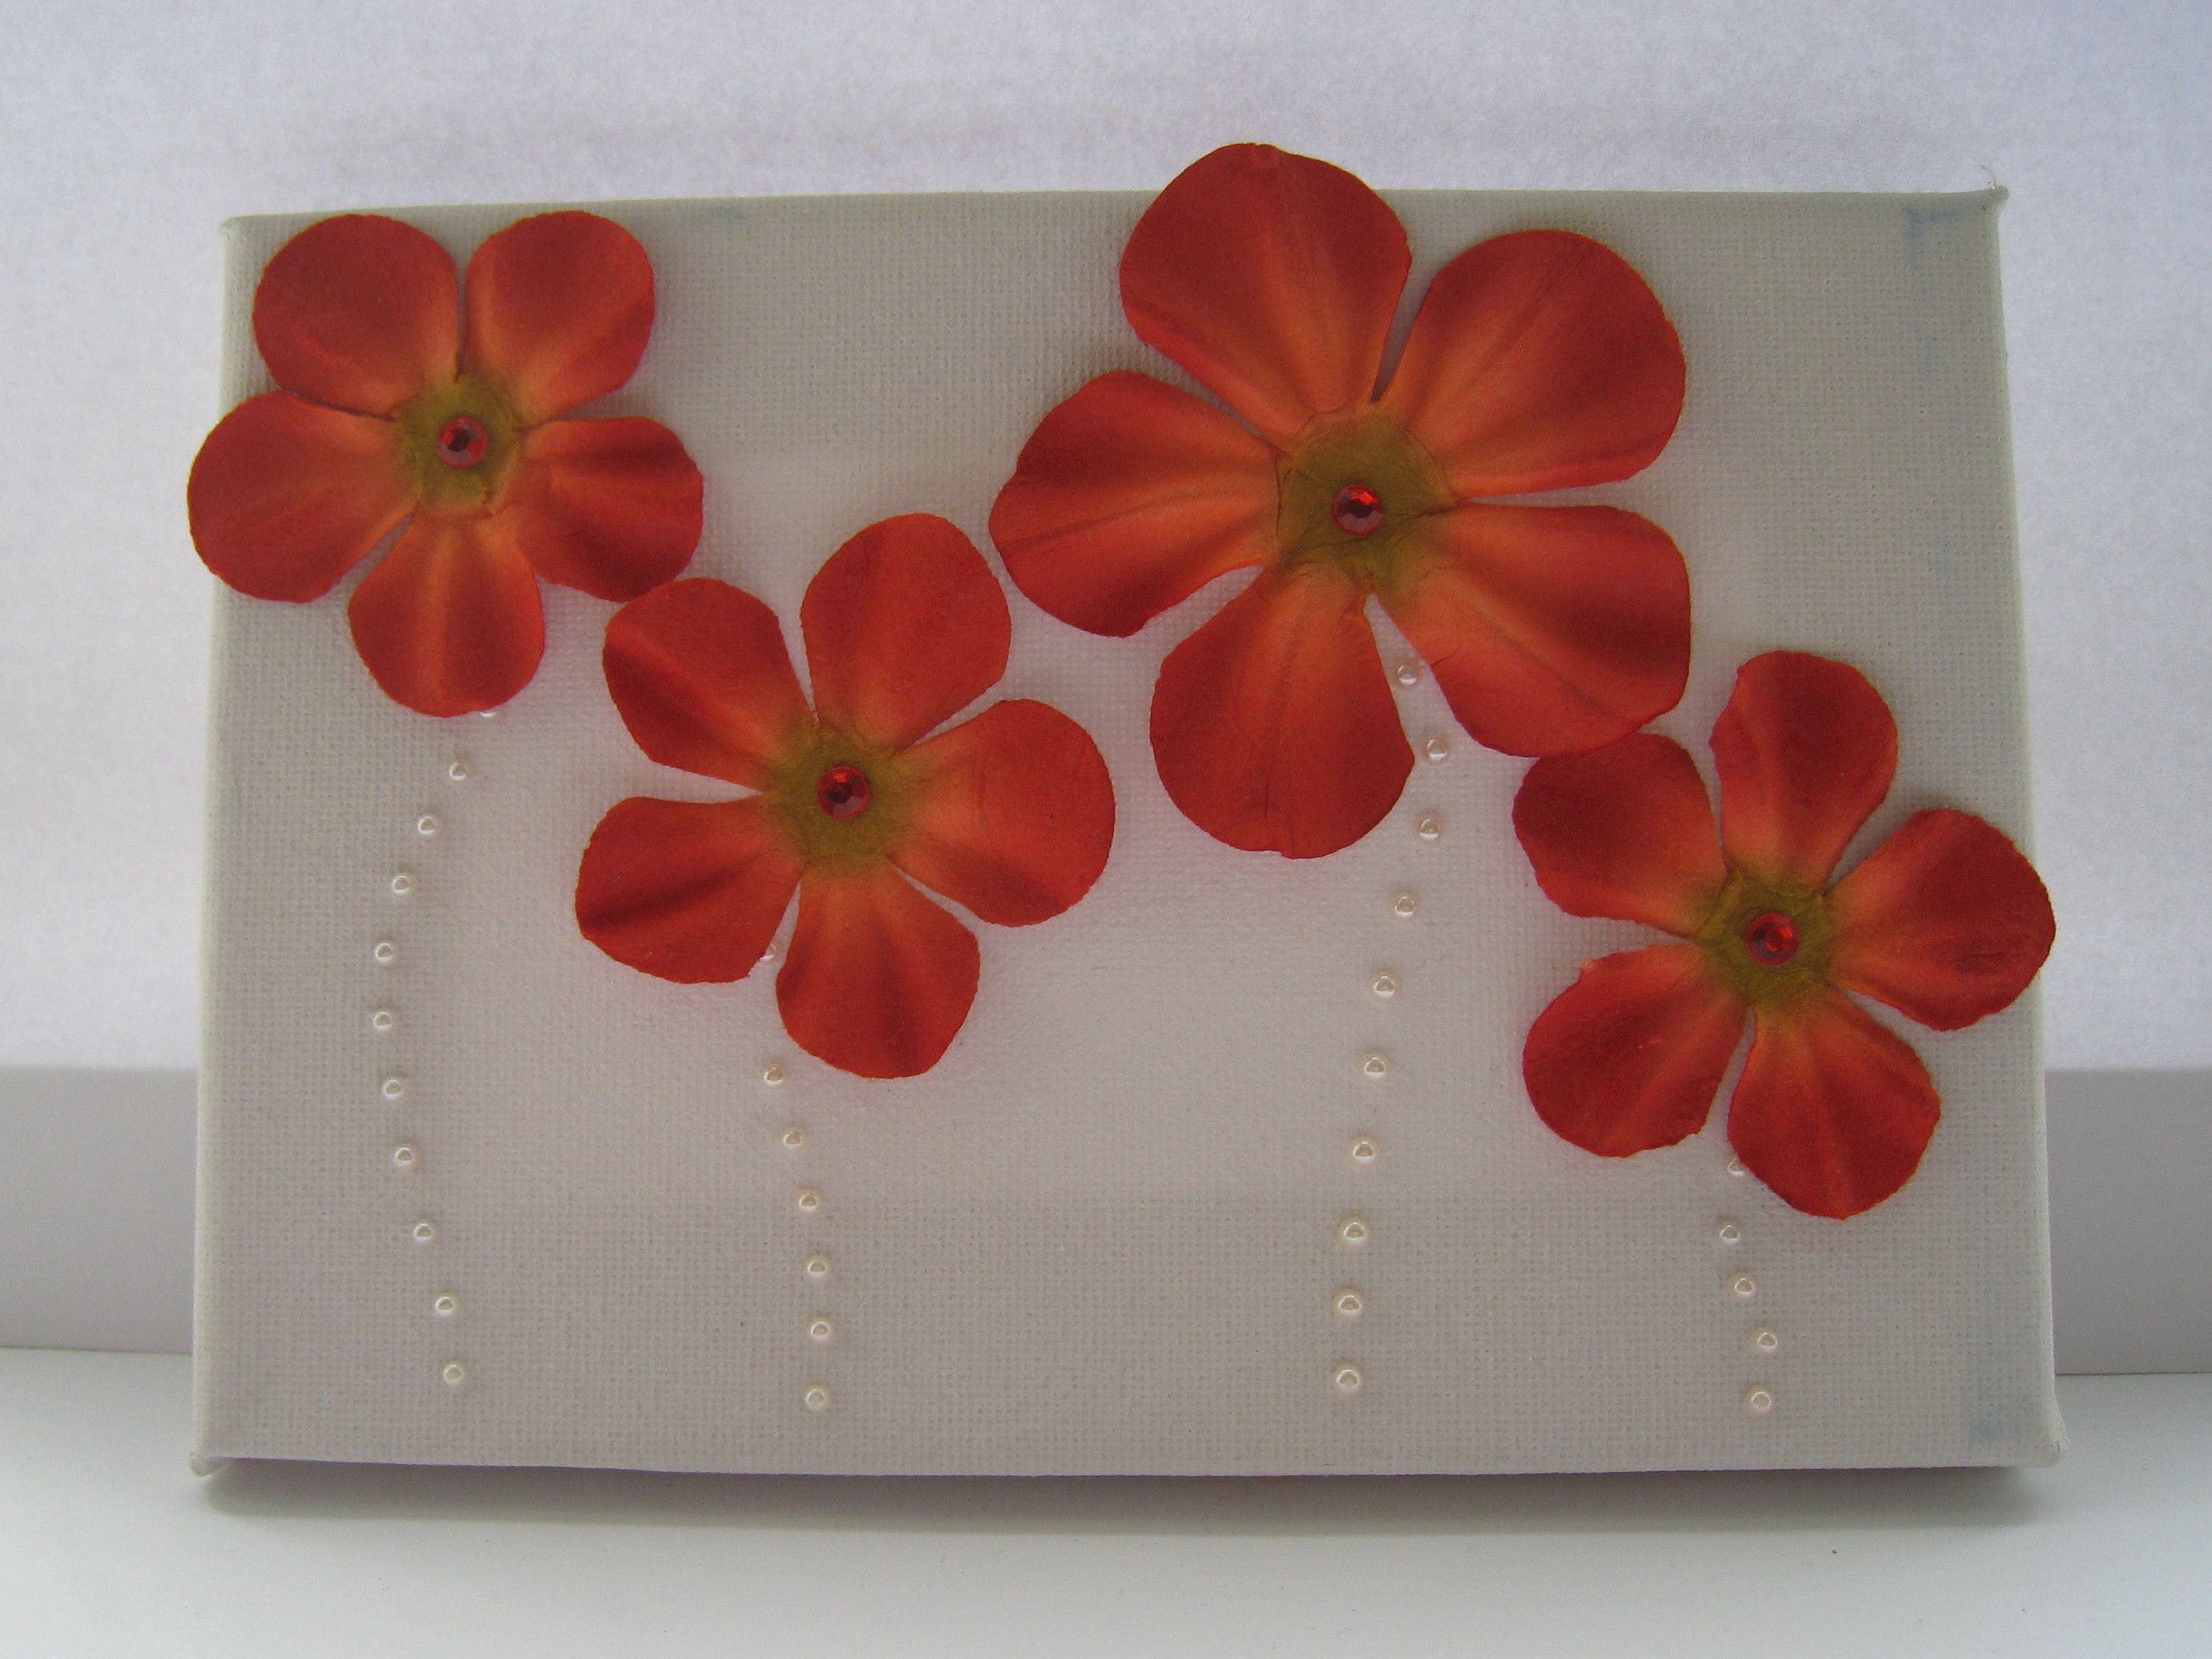 Paper Flower Art On Canvas Ideas For The House Pinterest